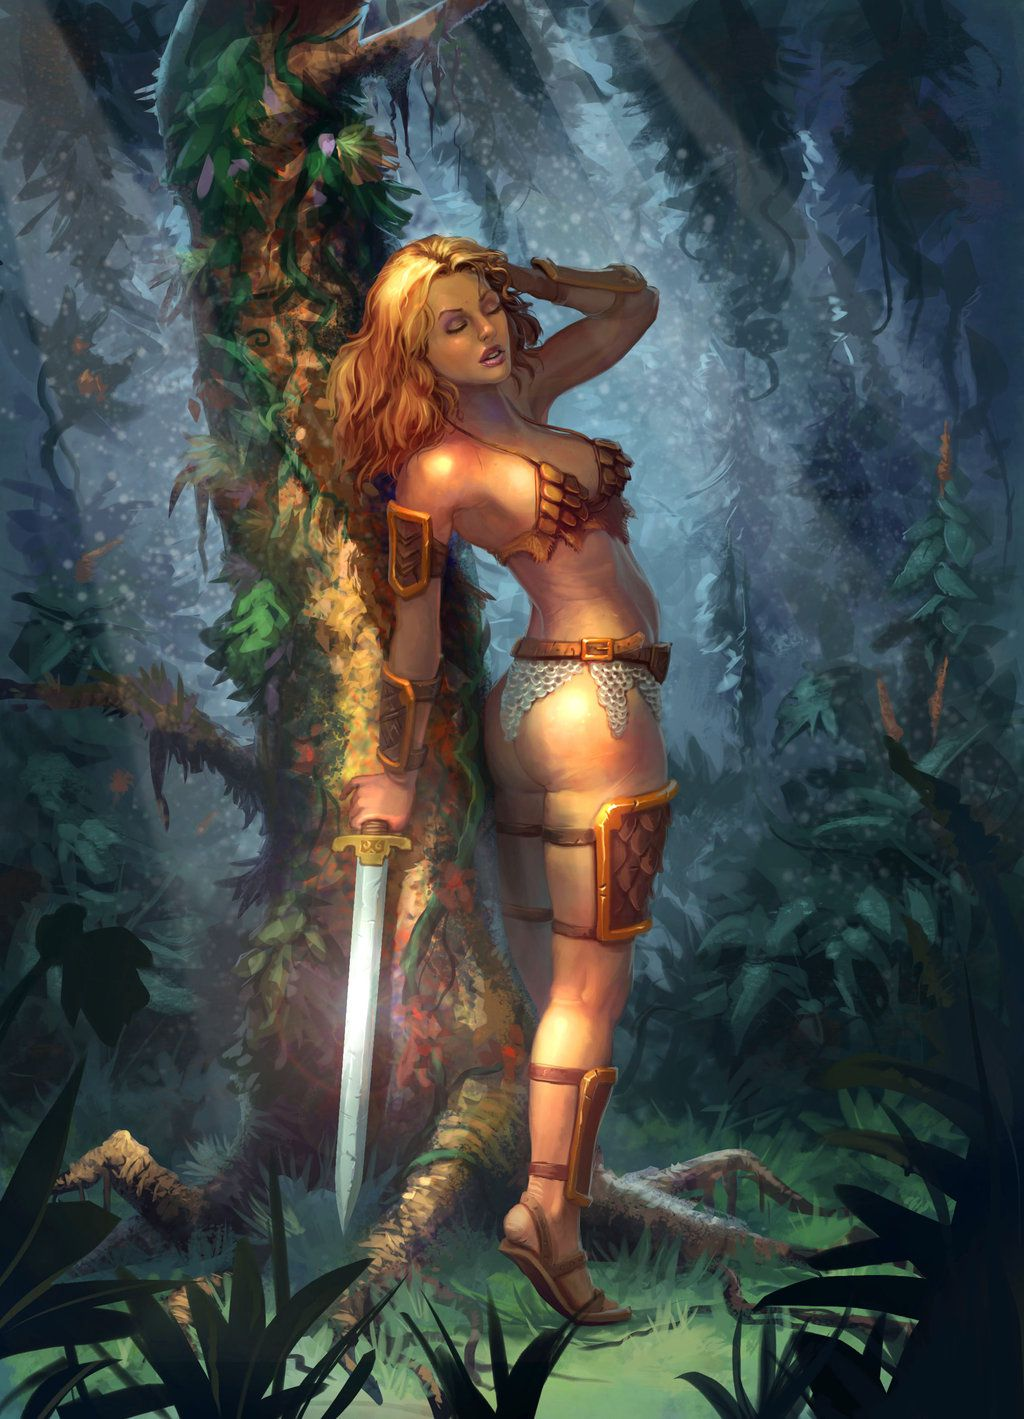 Cartoon fantasy images of hot women with  erotic movie